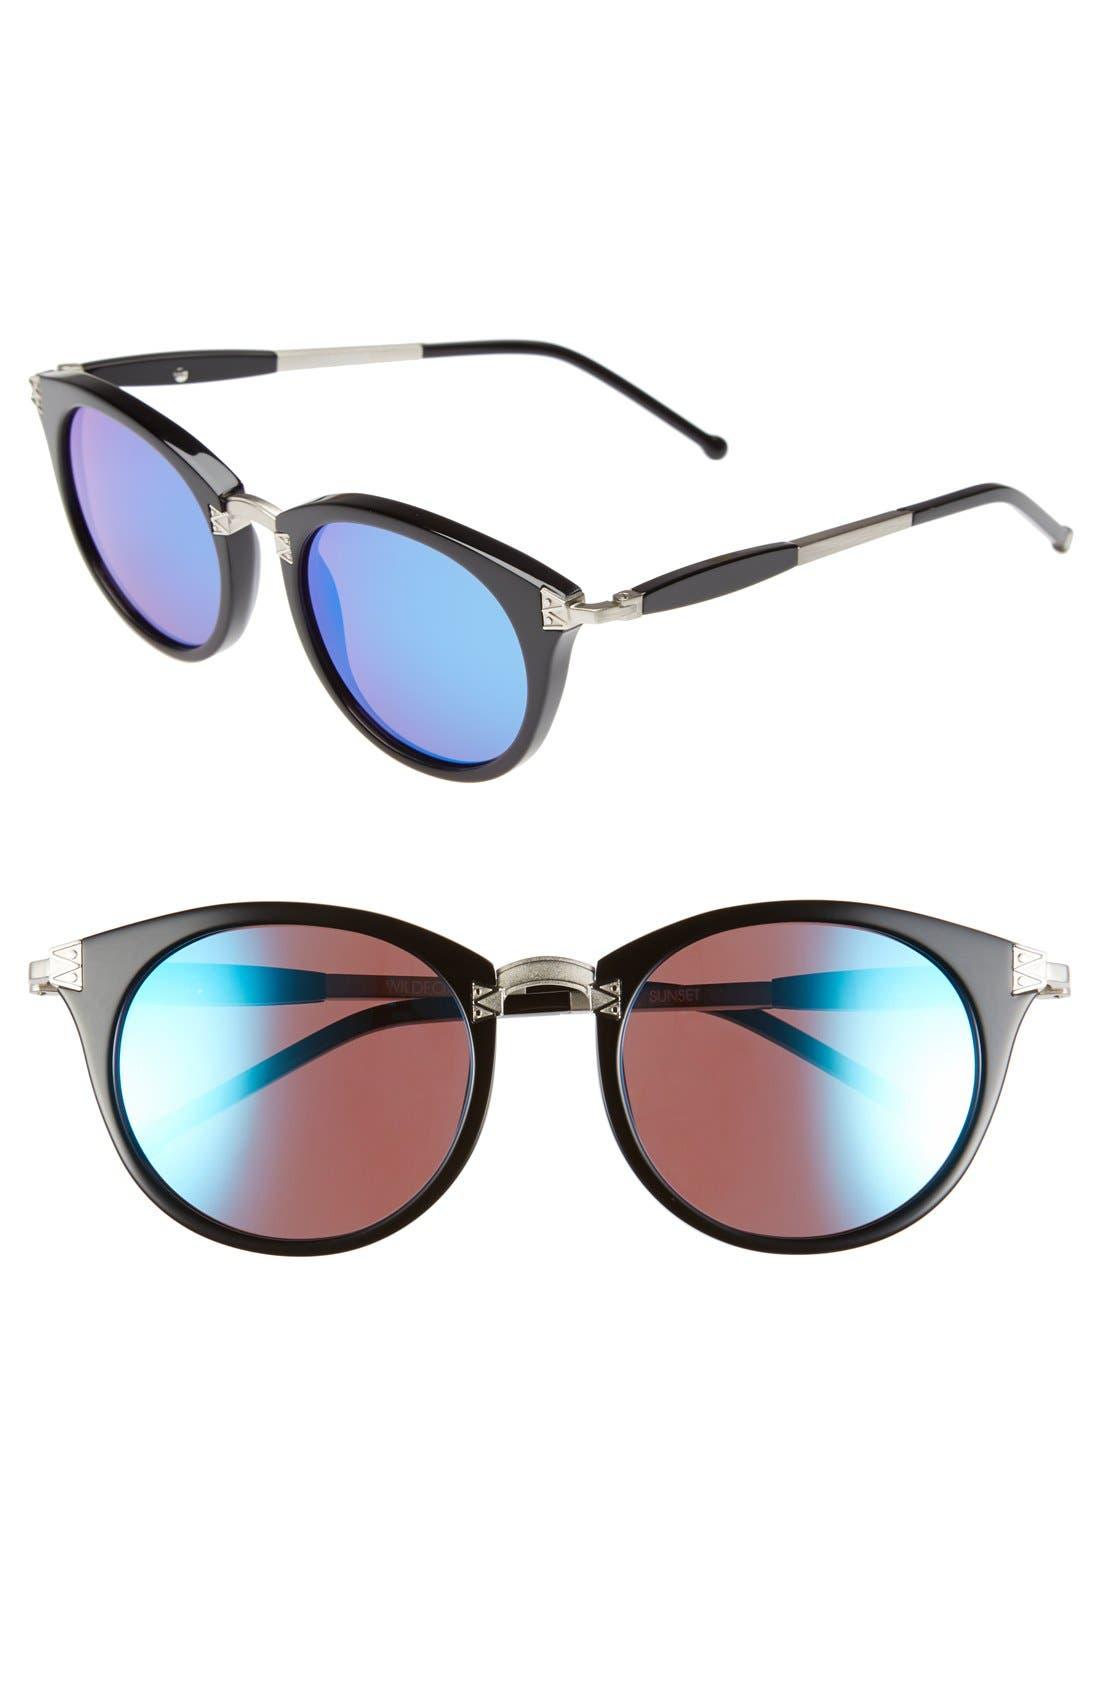 Main Image - Wildfox 'Sunset Deluxe' 48mm Retro Sunglasses